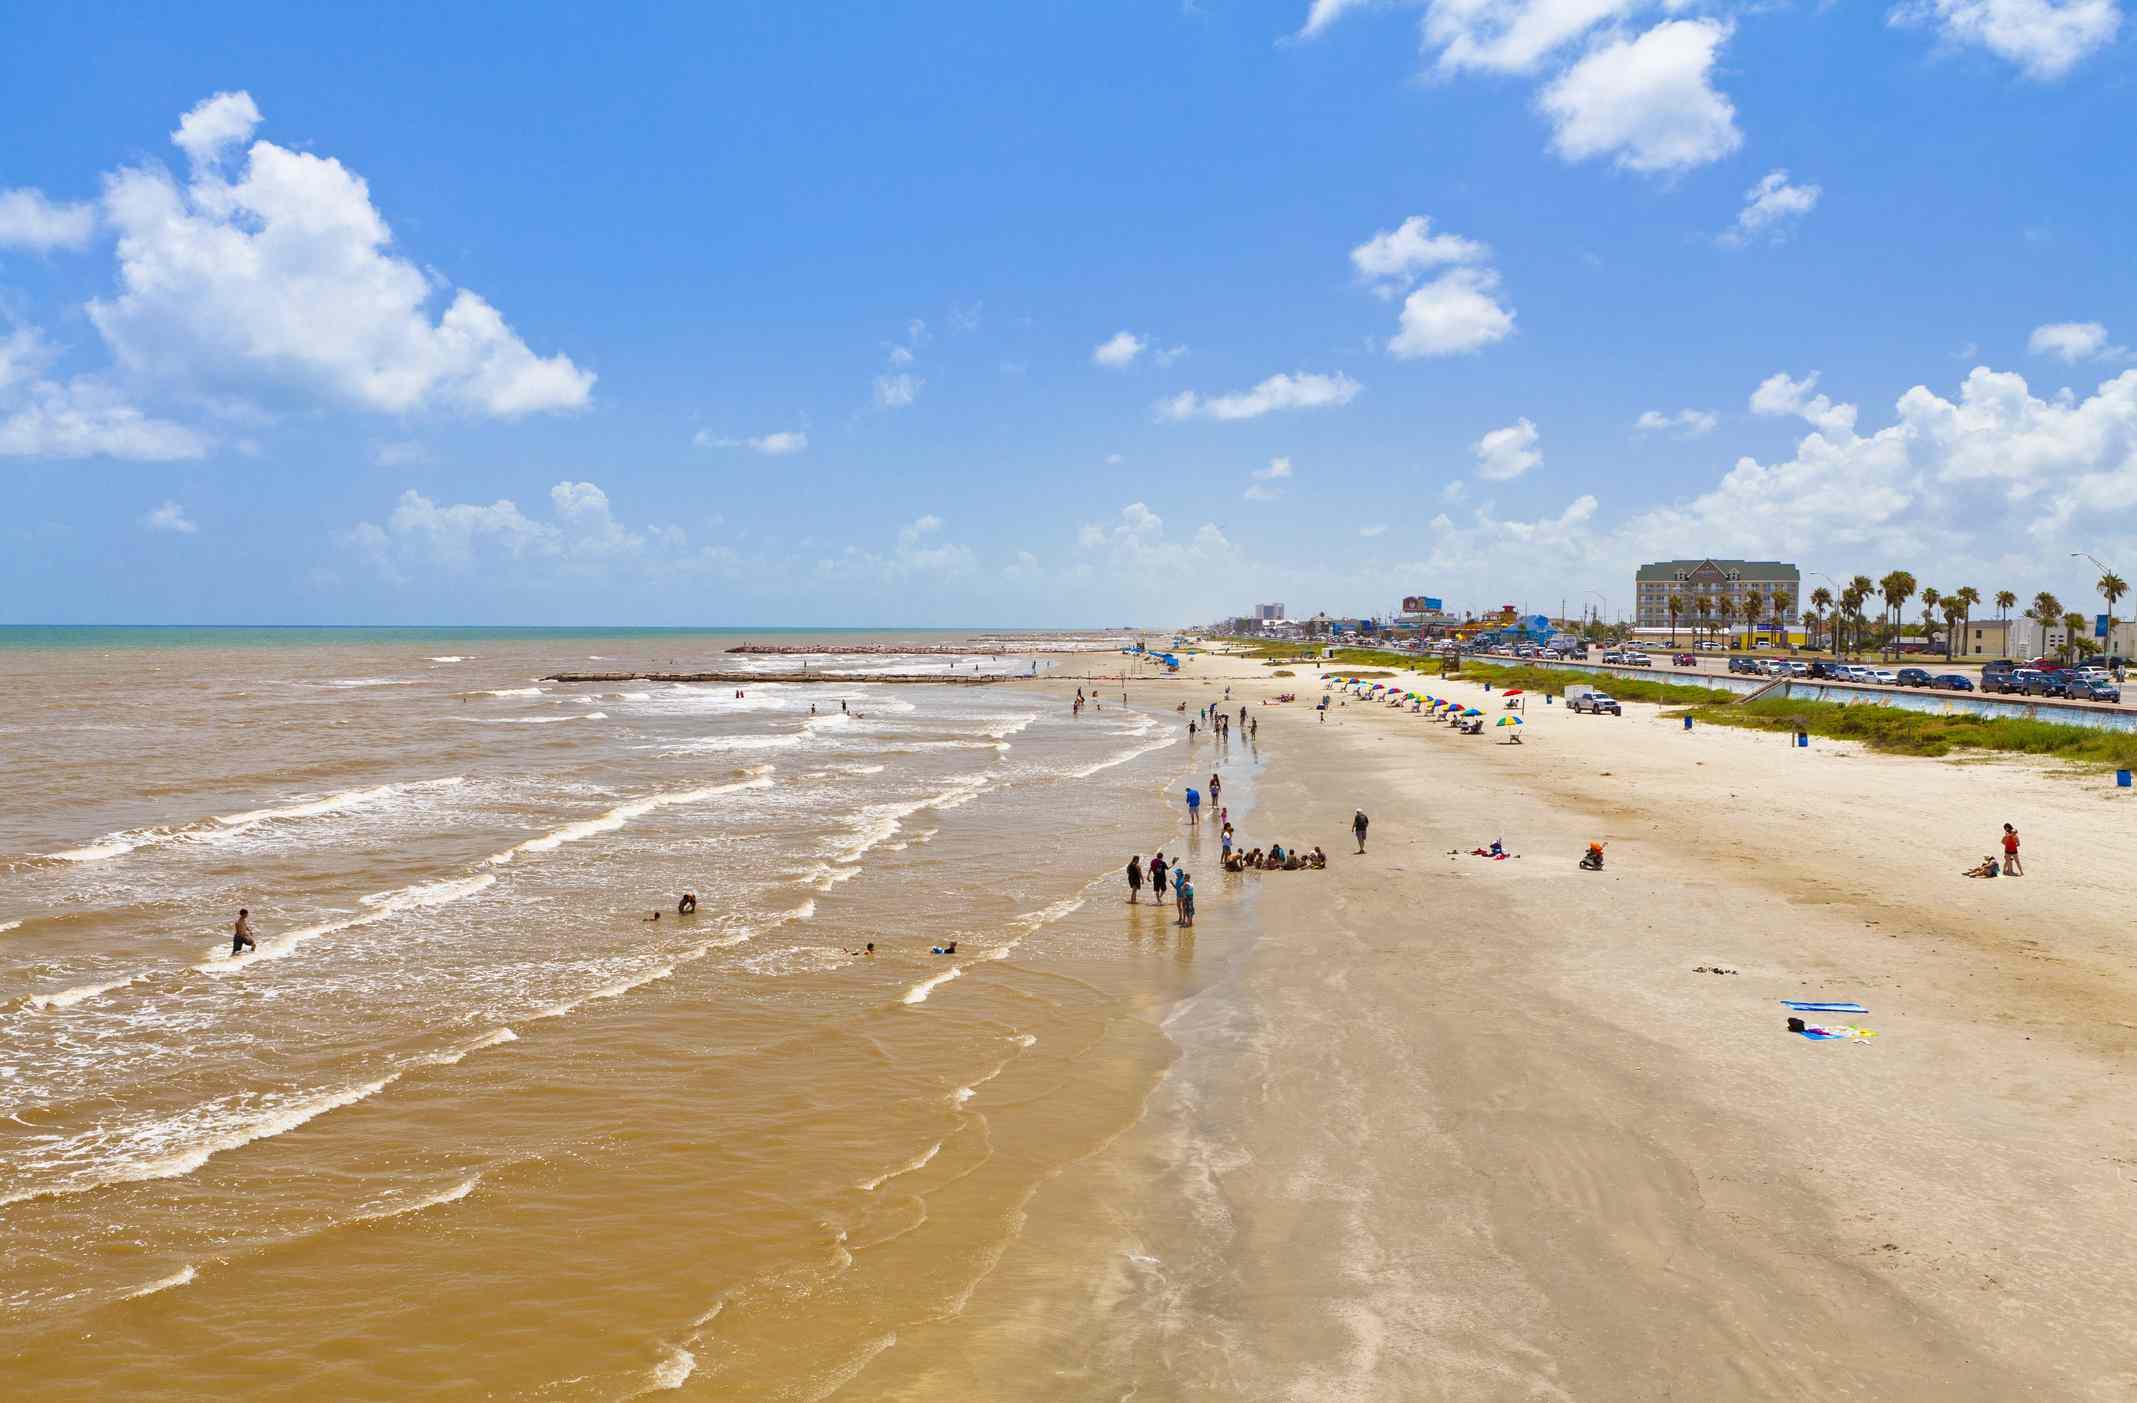 The Best Beaches Near Houston